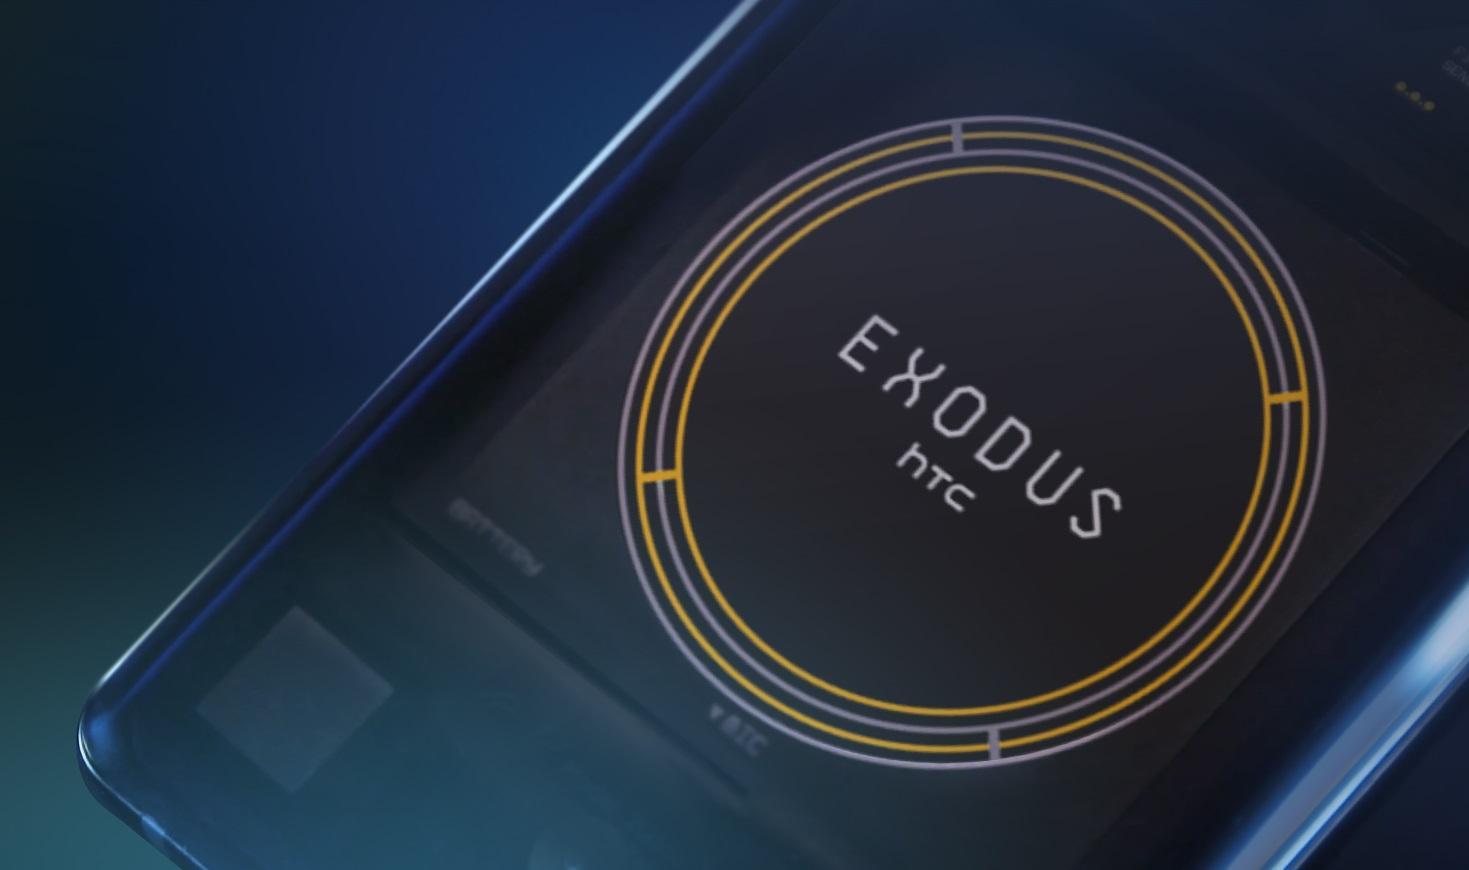 HTC EXODUS 1 - اچ تی سی اکسدس وان - تلفن همراه هوشمند یا کیف پول سخت افزاری ارزهای مجازی؟